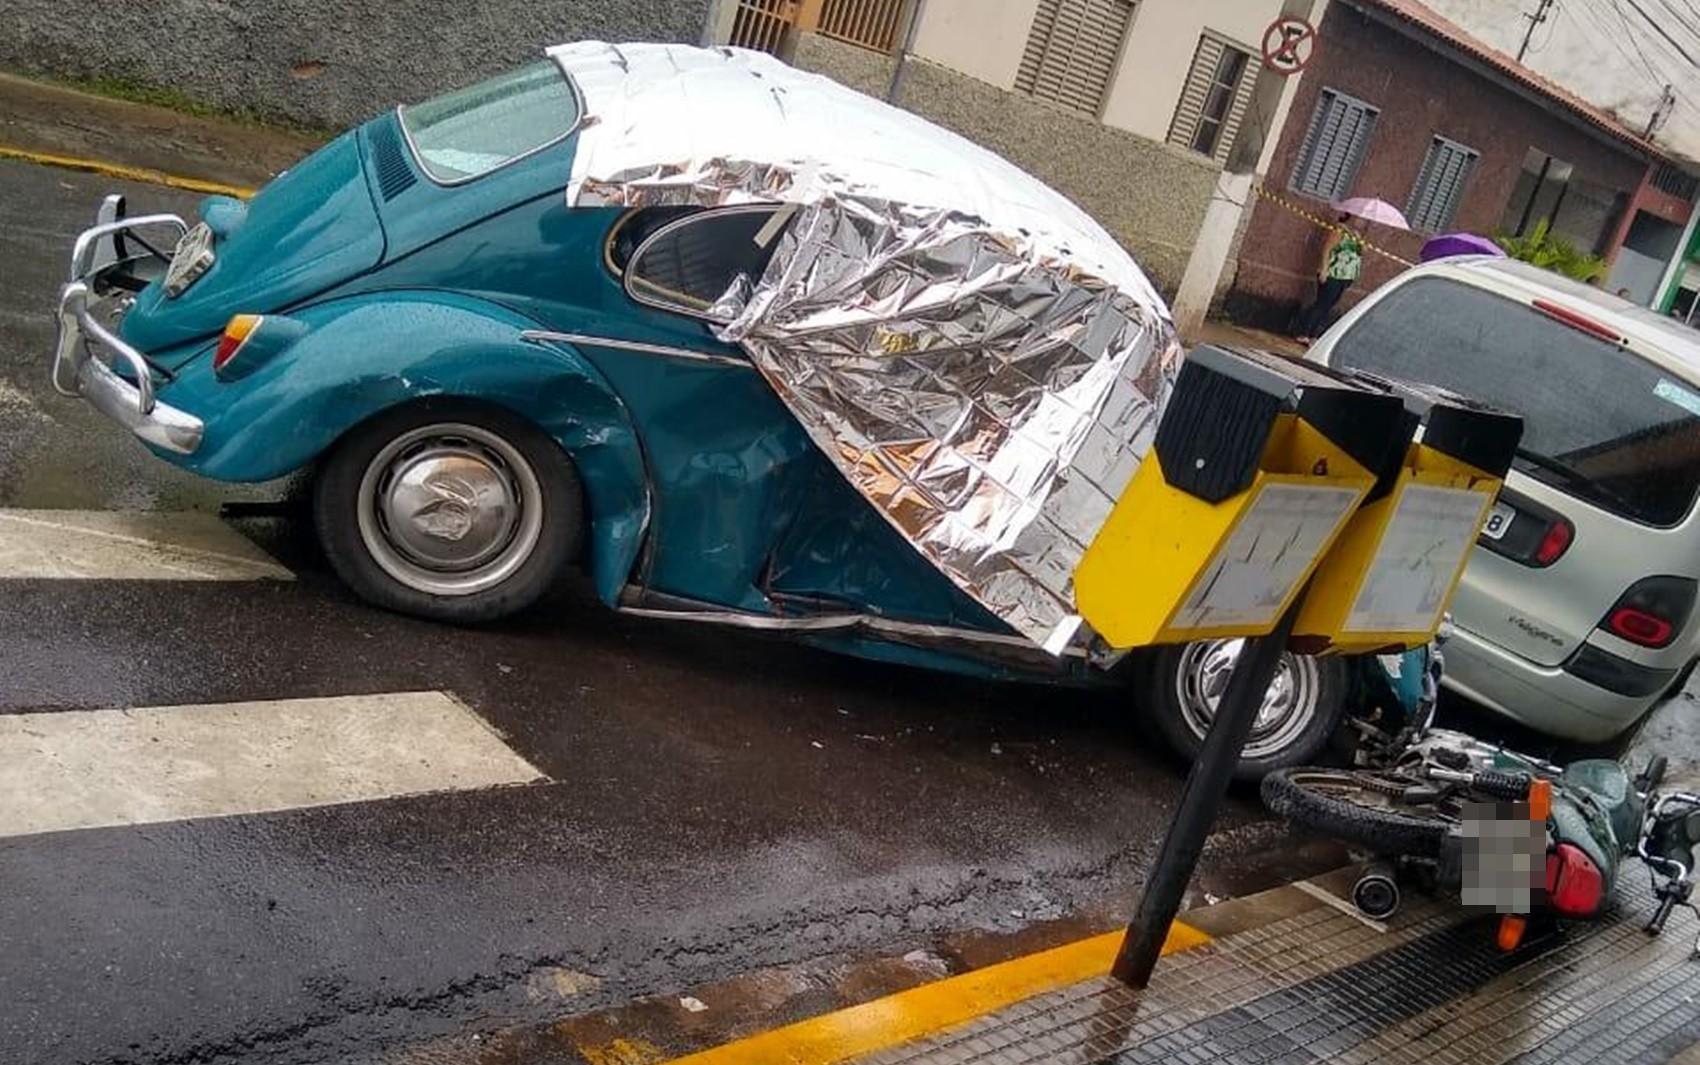 Homem morre após passar mal e bater carro em Itajubá, MG